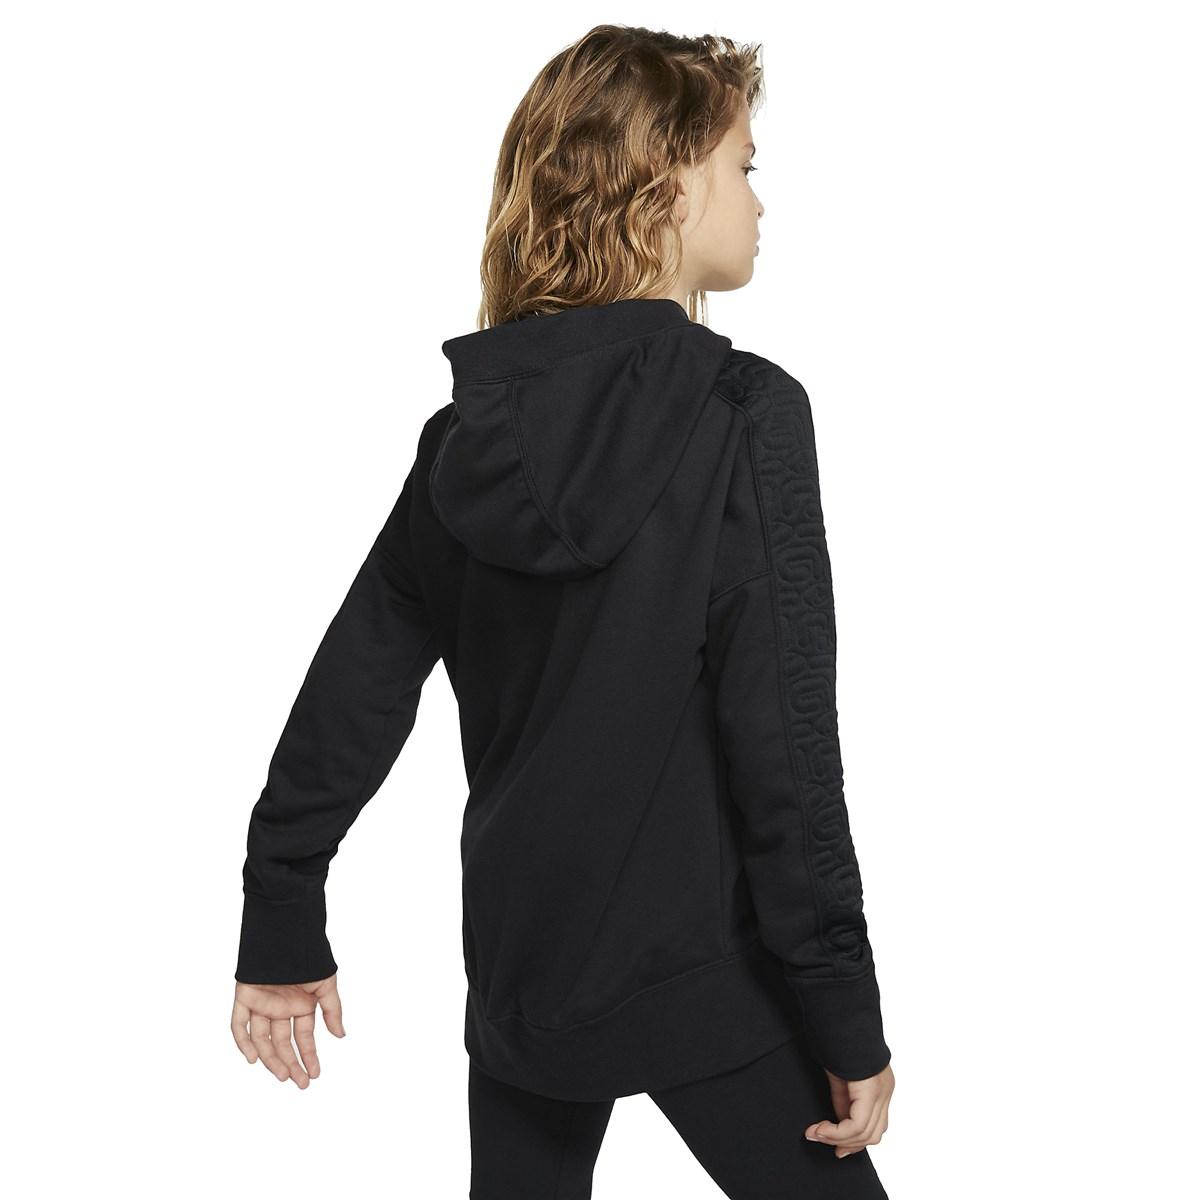 Air Pullover Çocuk Siyah Sweatshirt (BV2709-010)